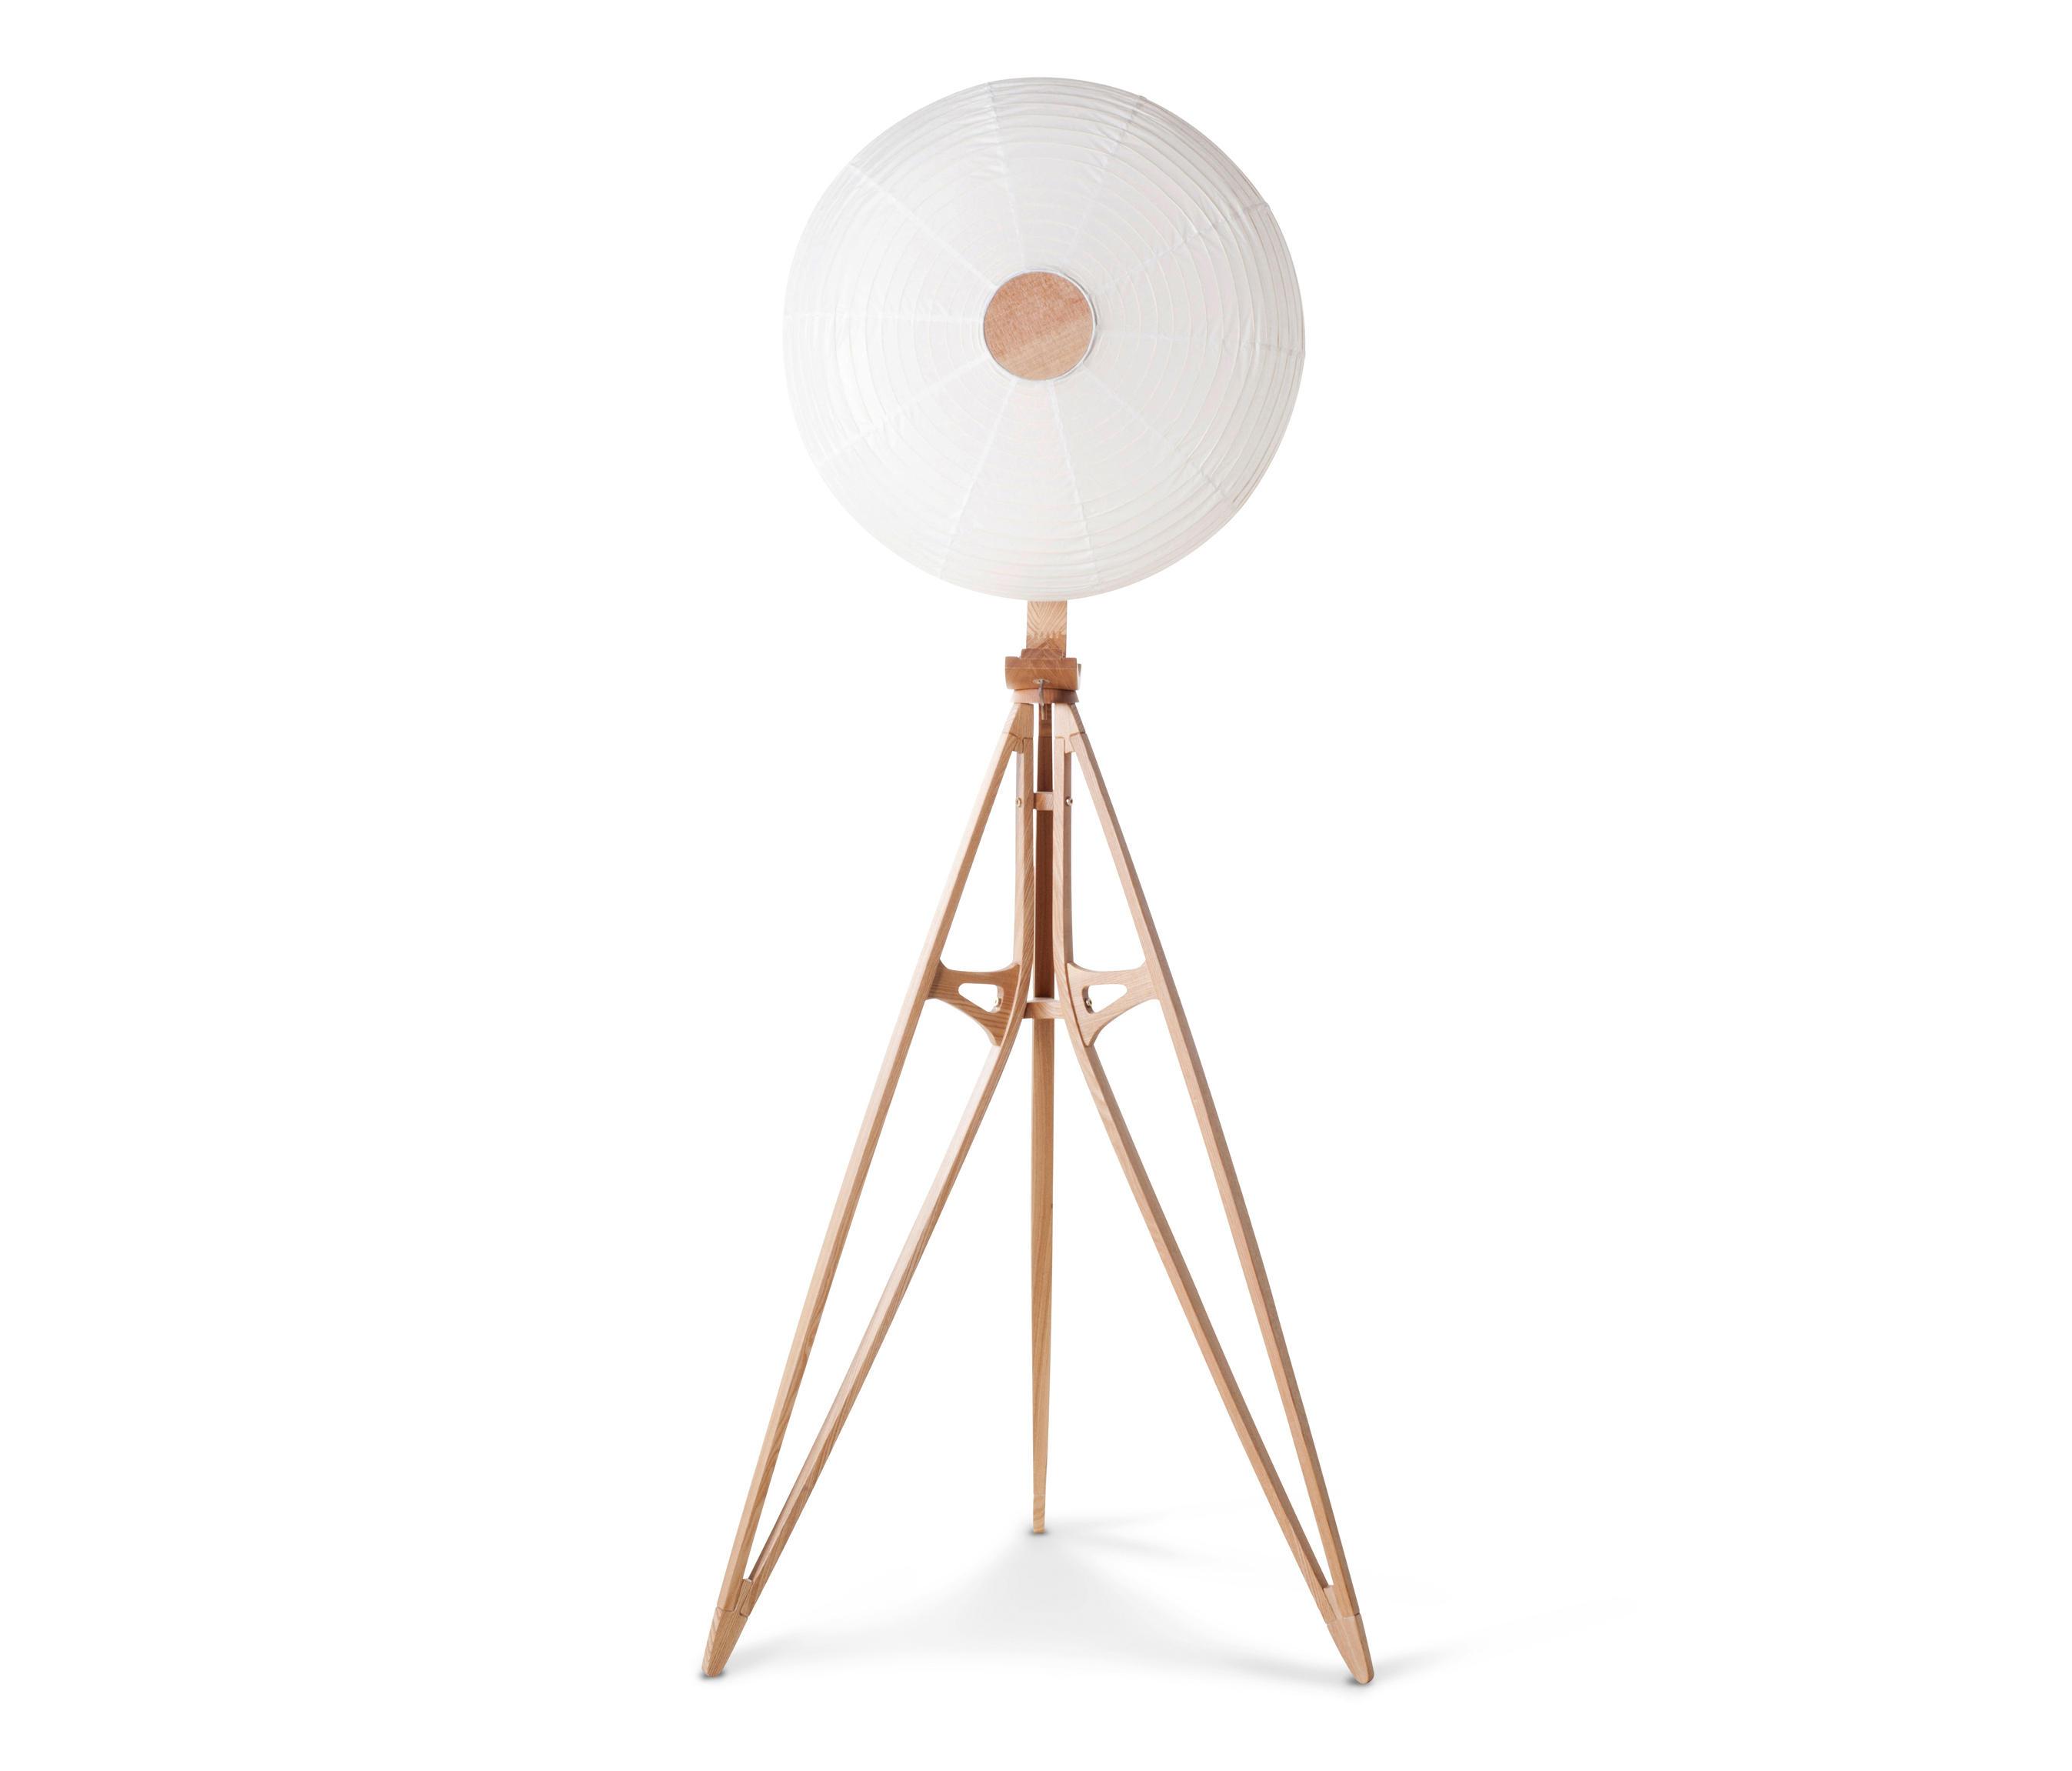 kyoto floor lamp free standing lights from stellar works. Black Bedroom Furniture Sets. Home Design Ideas